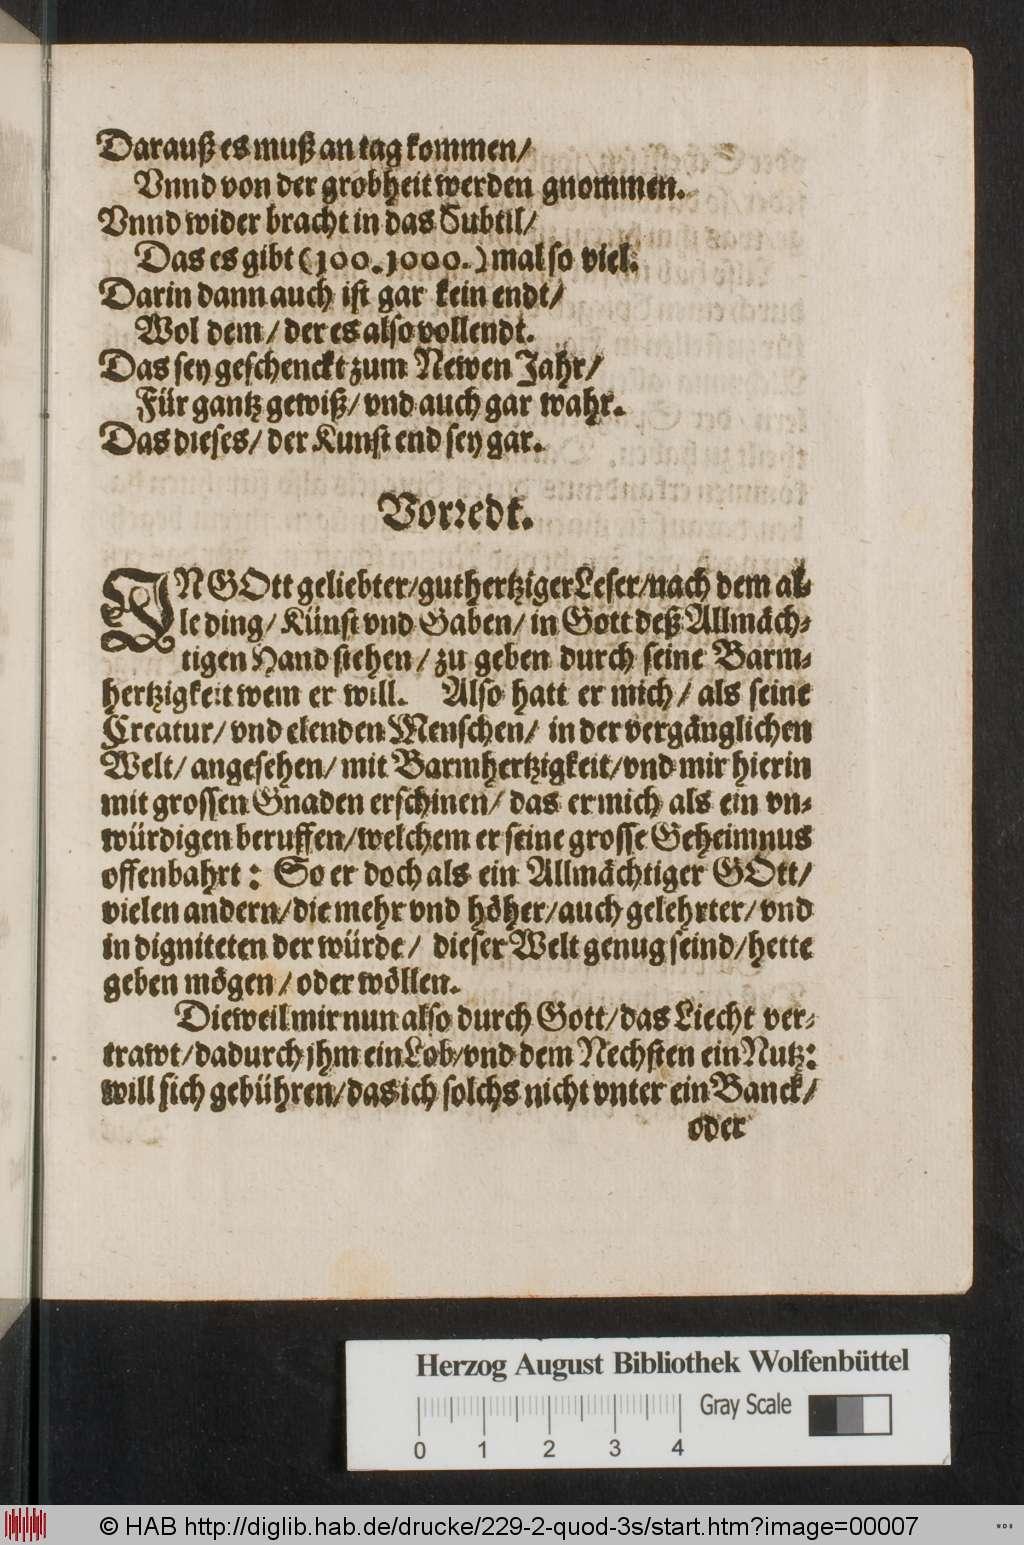 http://diglib.hab.de/drucke/229-2-quod-3s/00007.jpg